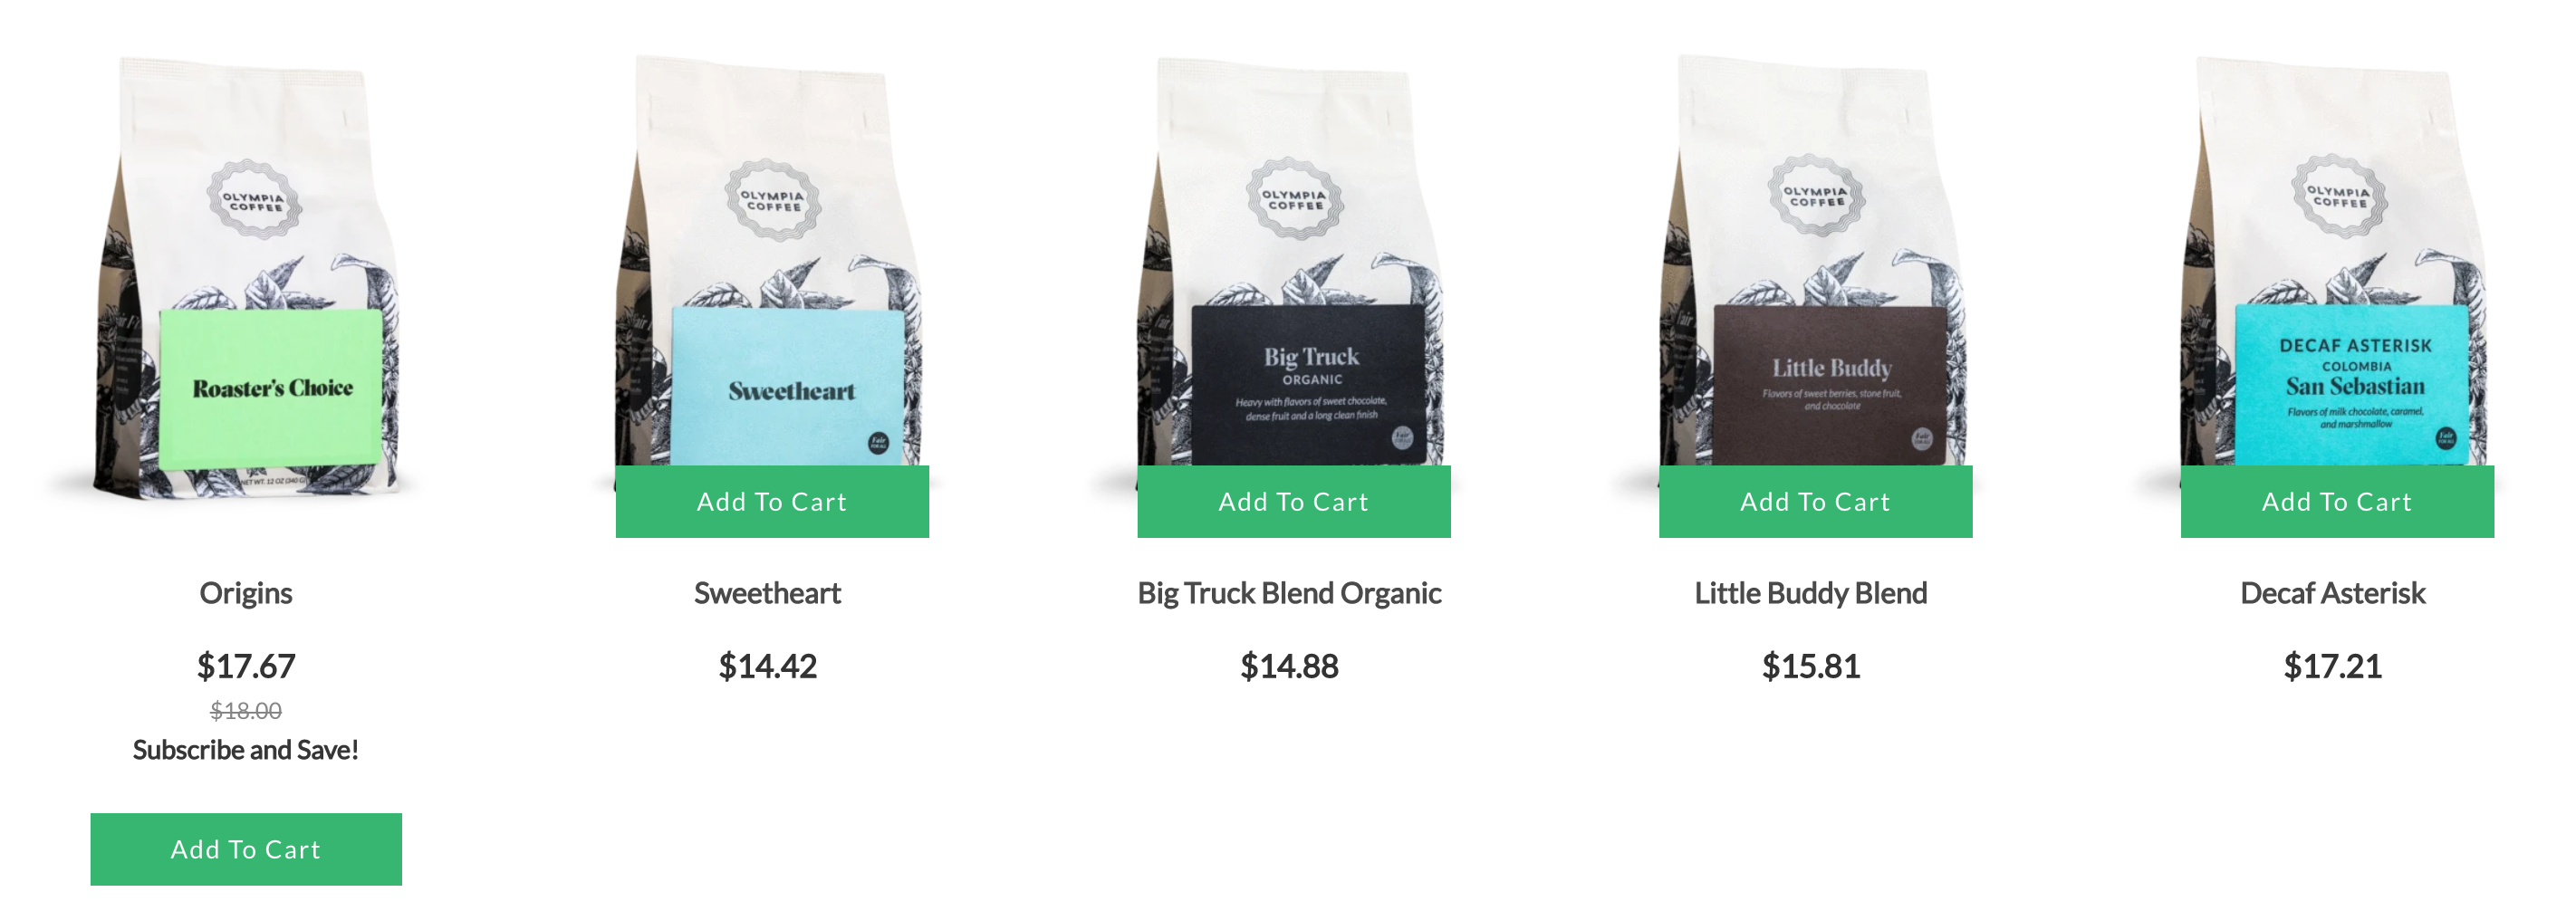 Row of coffee bean bags